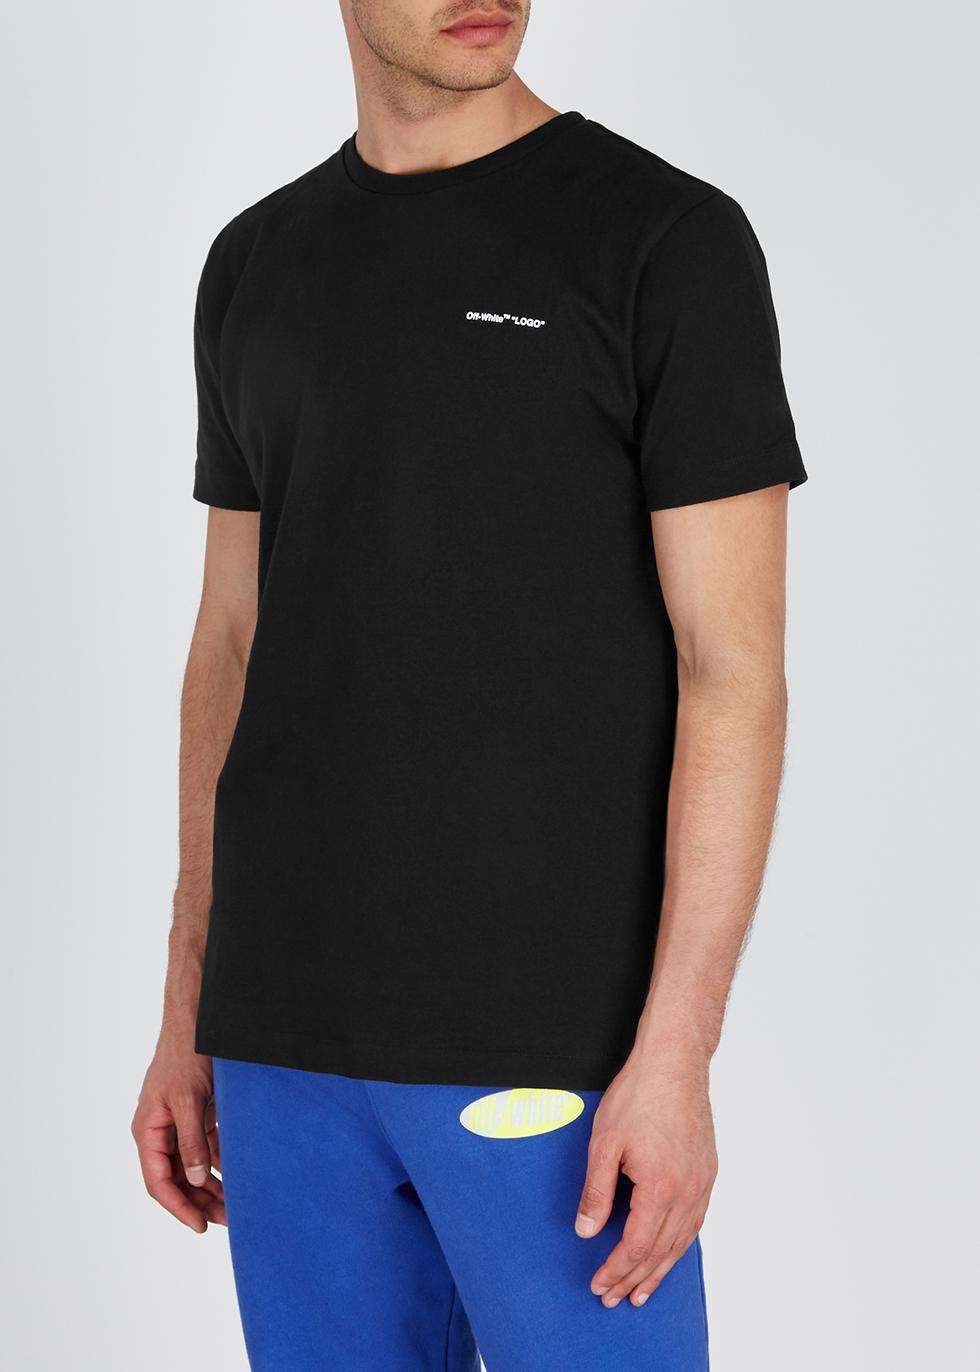 Black logo cotton T-shirt - Off-White